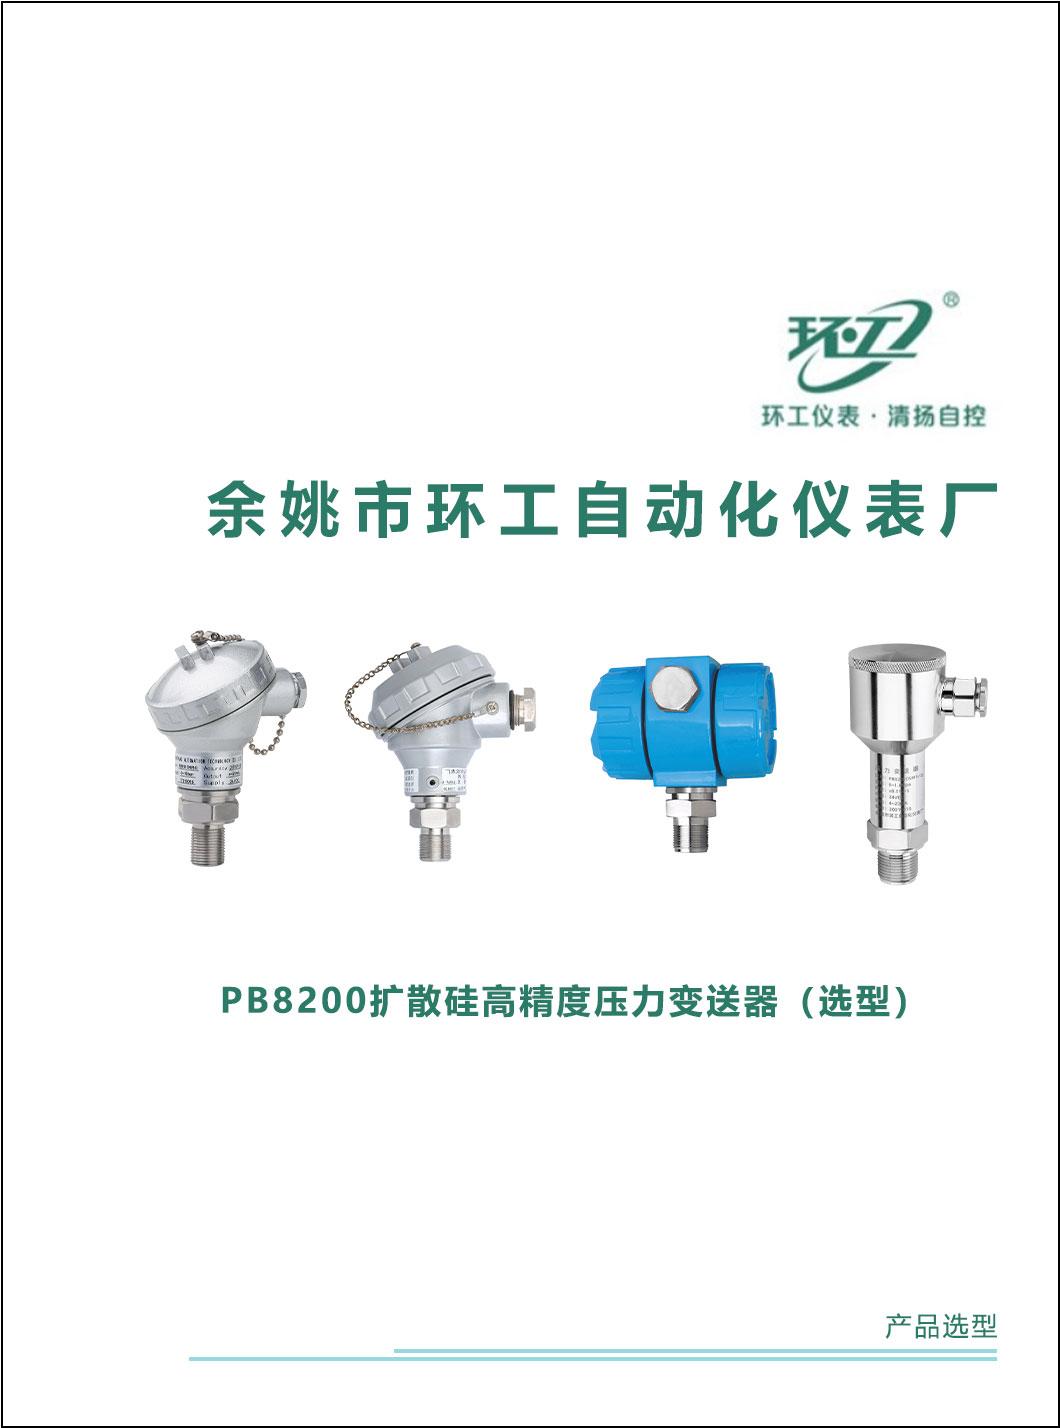 PB8200扩散硅高精度压力变送器-环工仪表-清扬自控